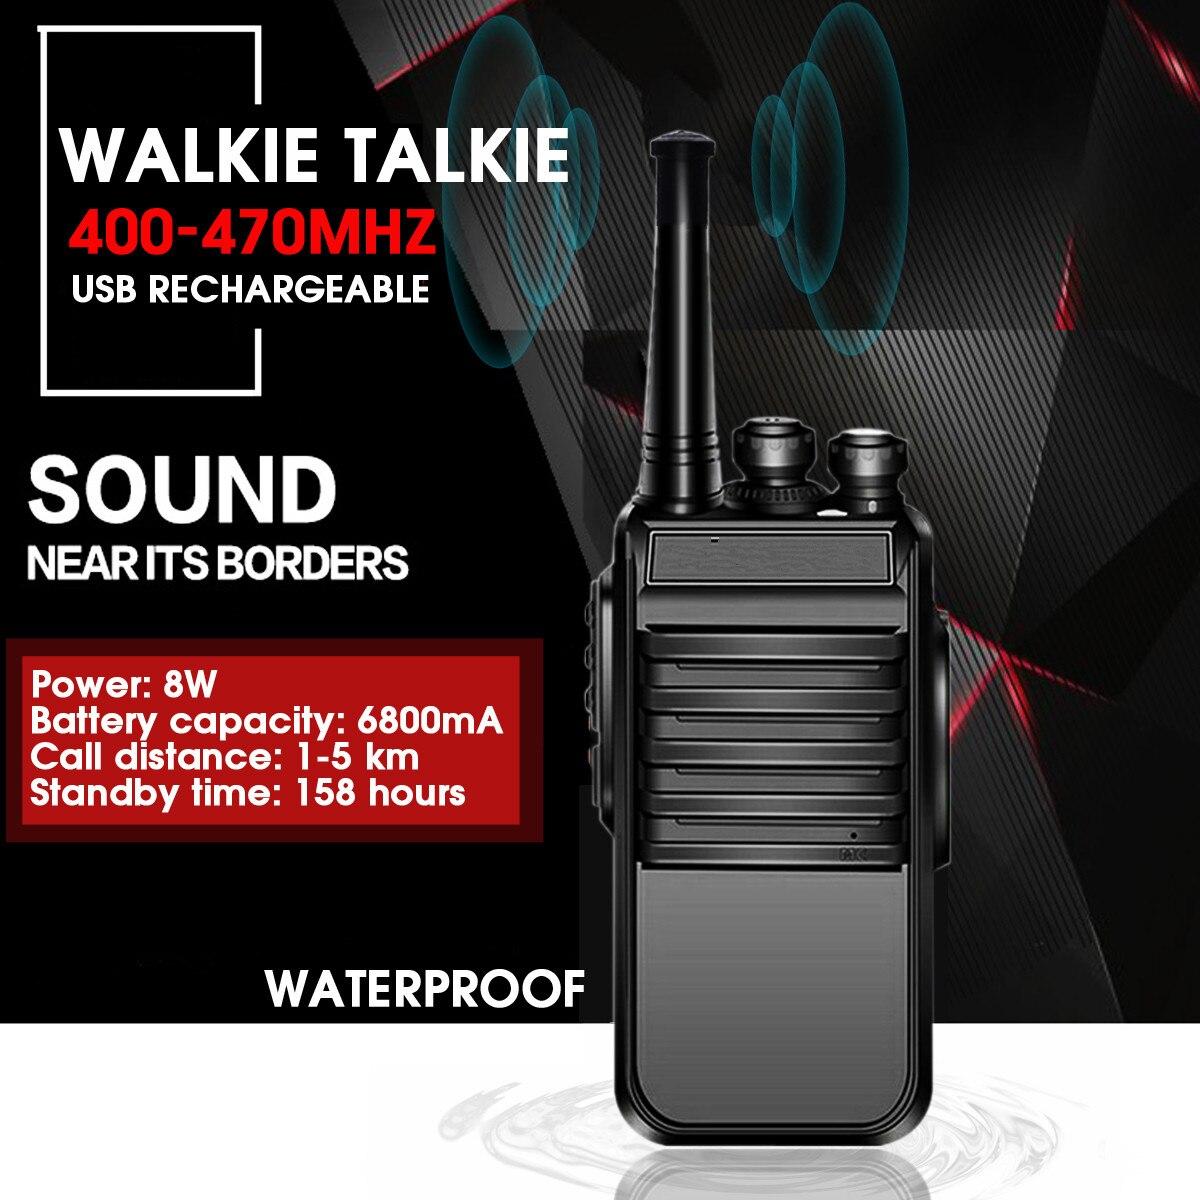 Baofeng E50 400-470MHZ Walkie Talkie Professional Radio Station Transceiver 8W Portable Radio 5km Talk-Range 6800mah